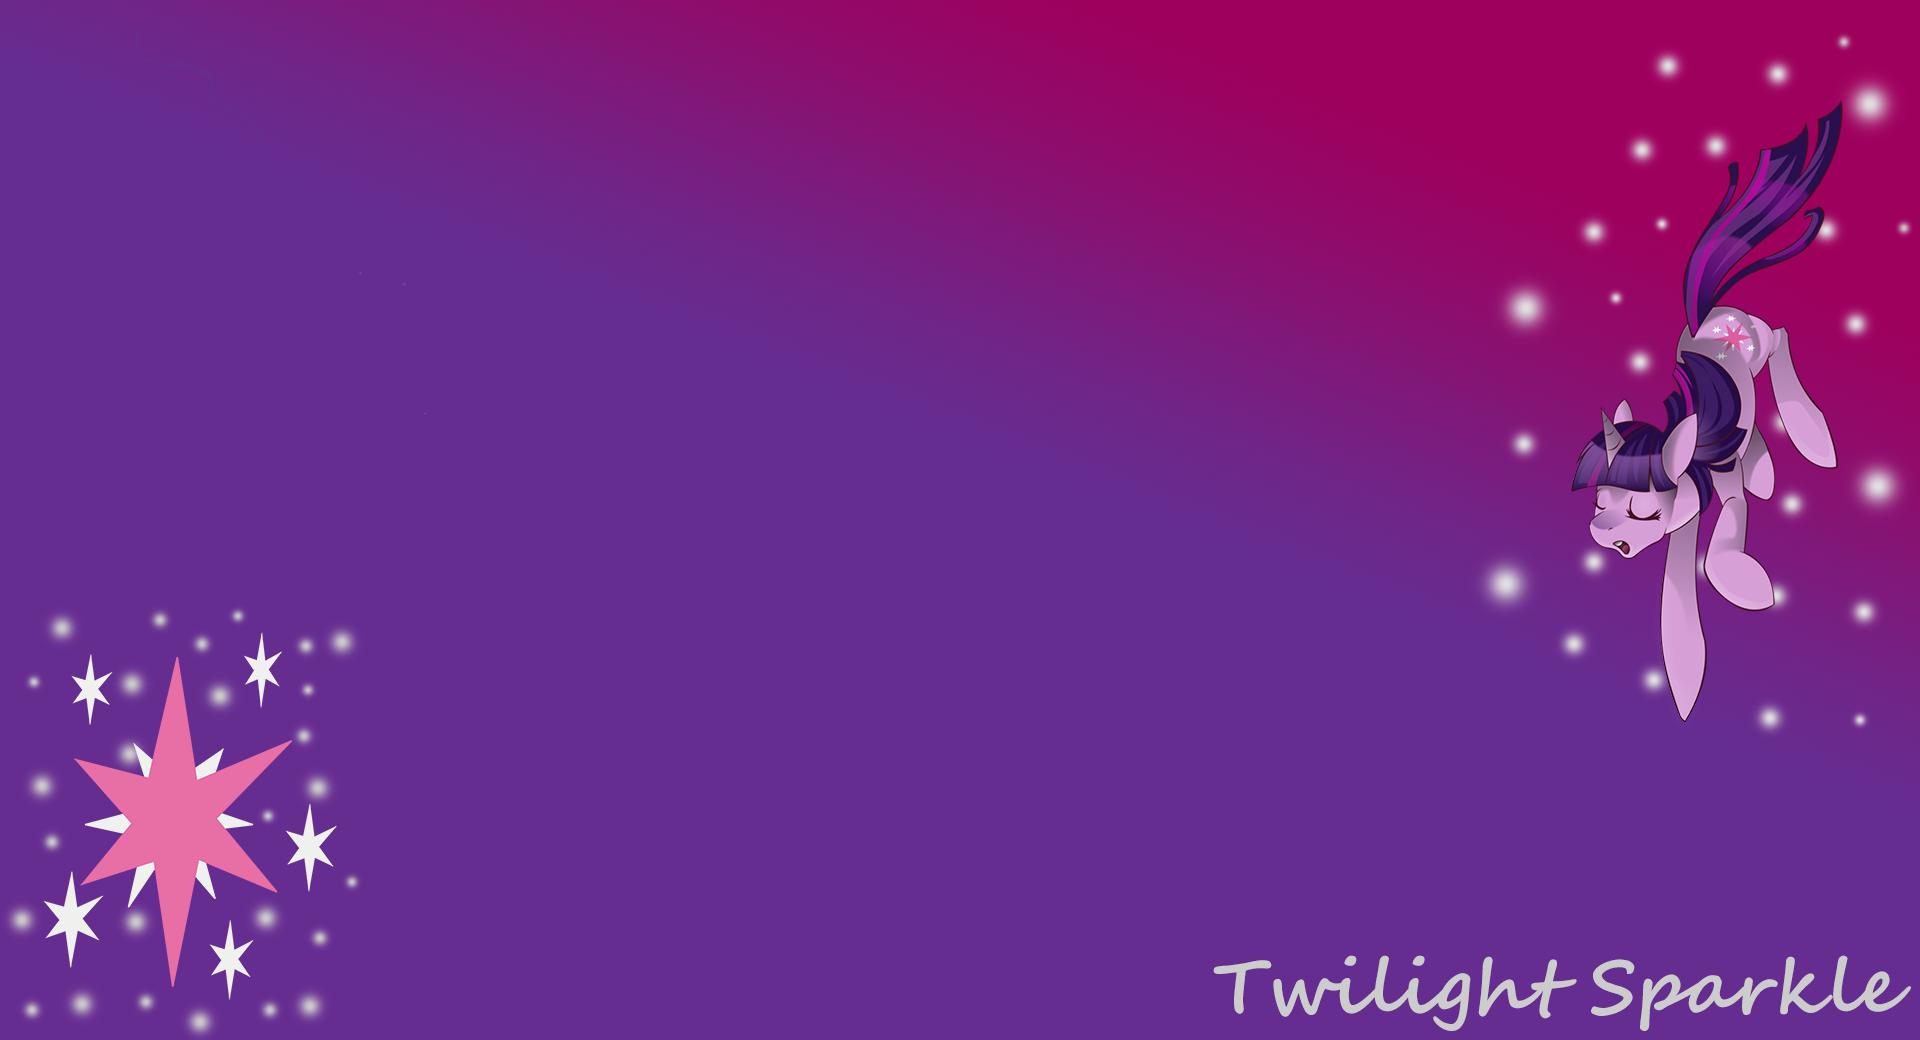 "Twilight Sparkloe ""Glitter"" wallpaper by DjDa5h, PheeBaDohDoh and racer437"